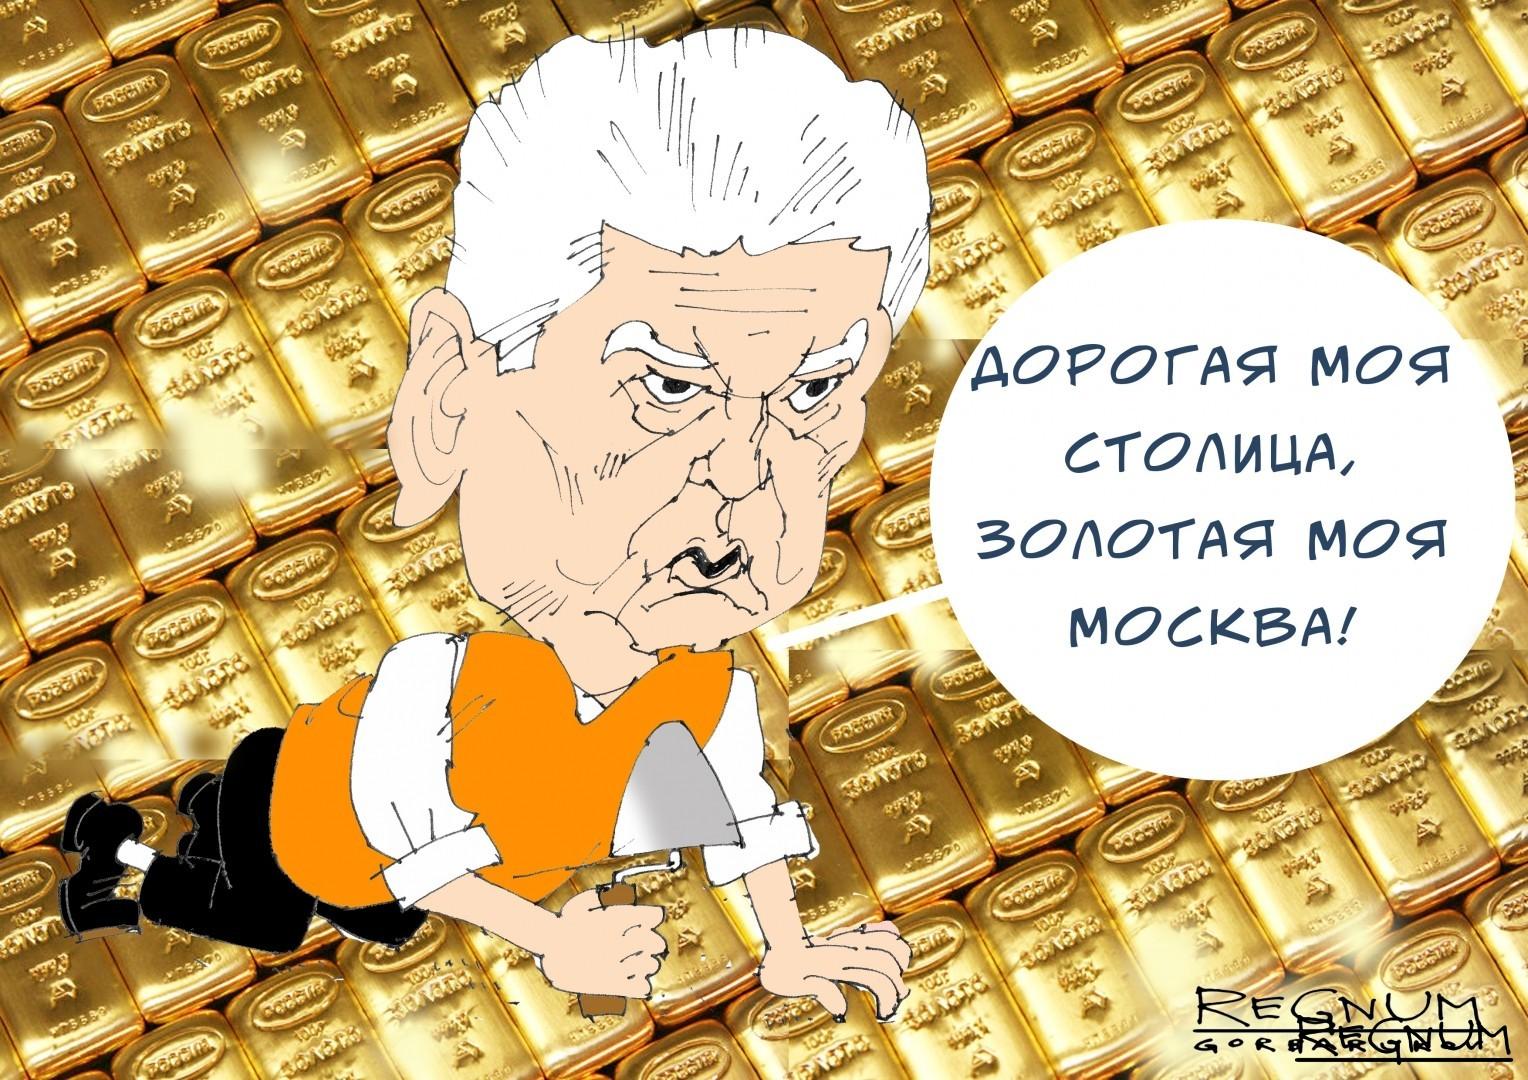 Золотая моя Москва!